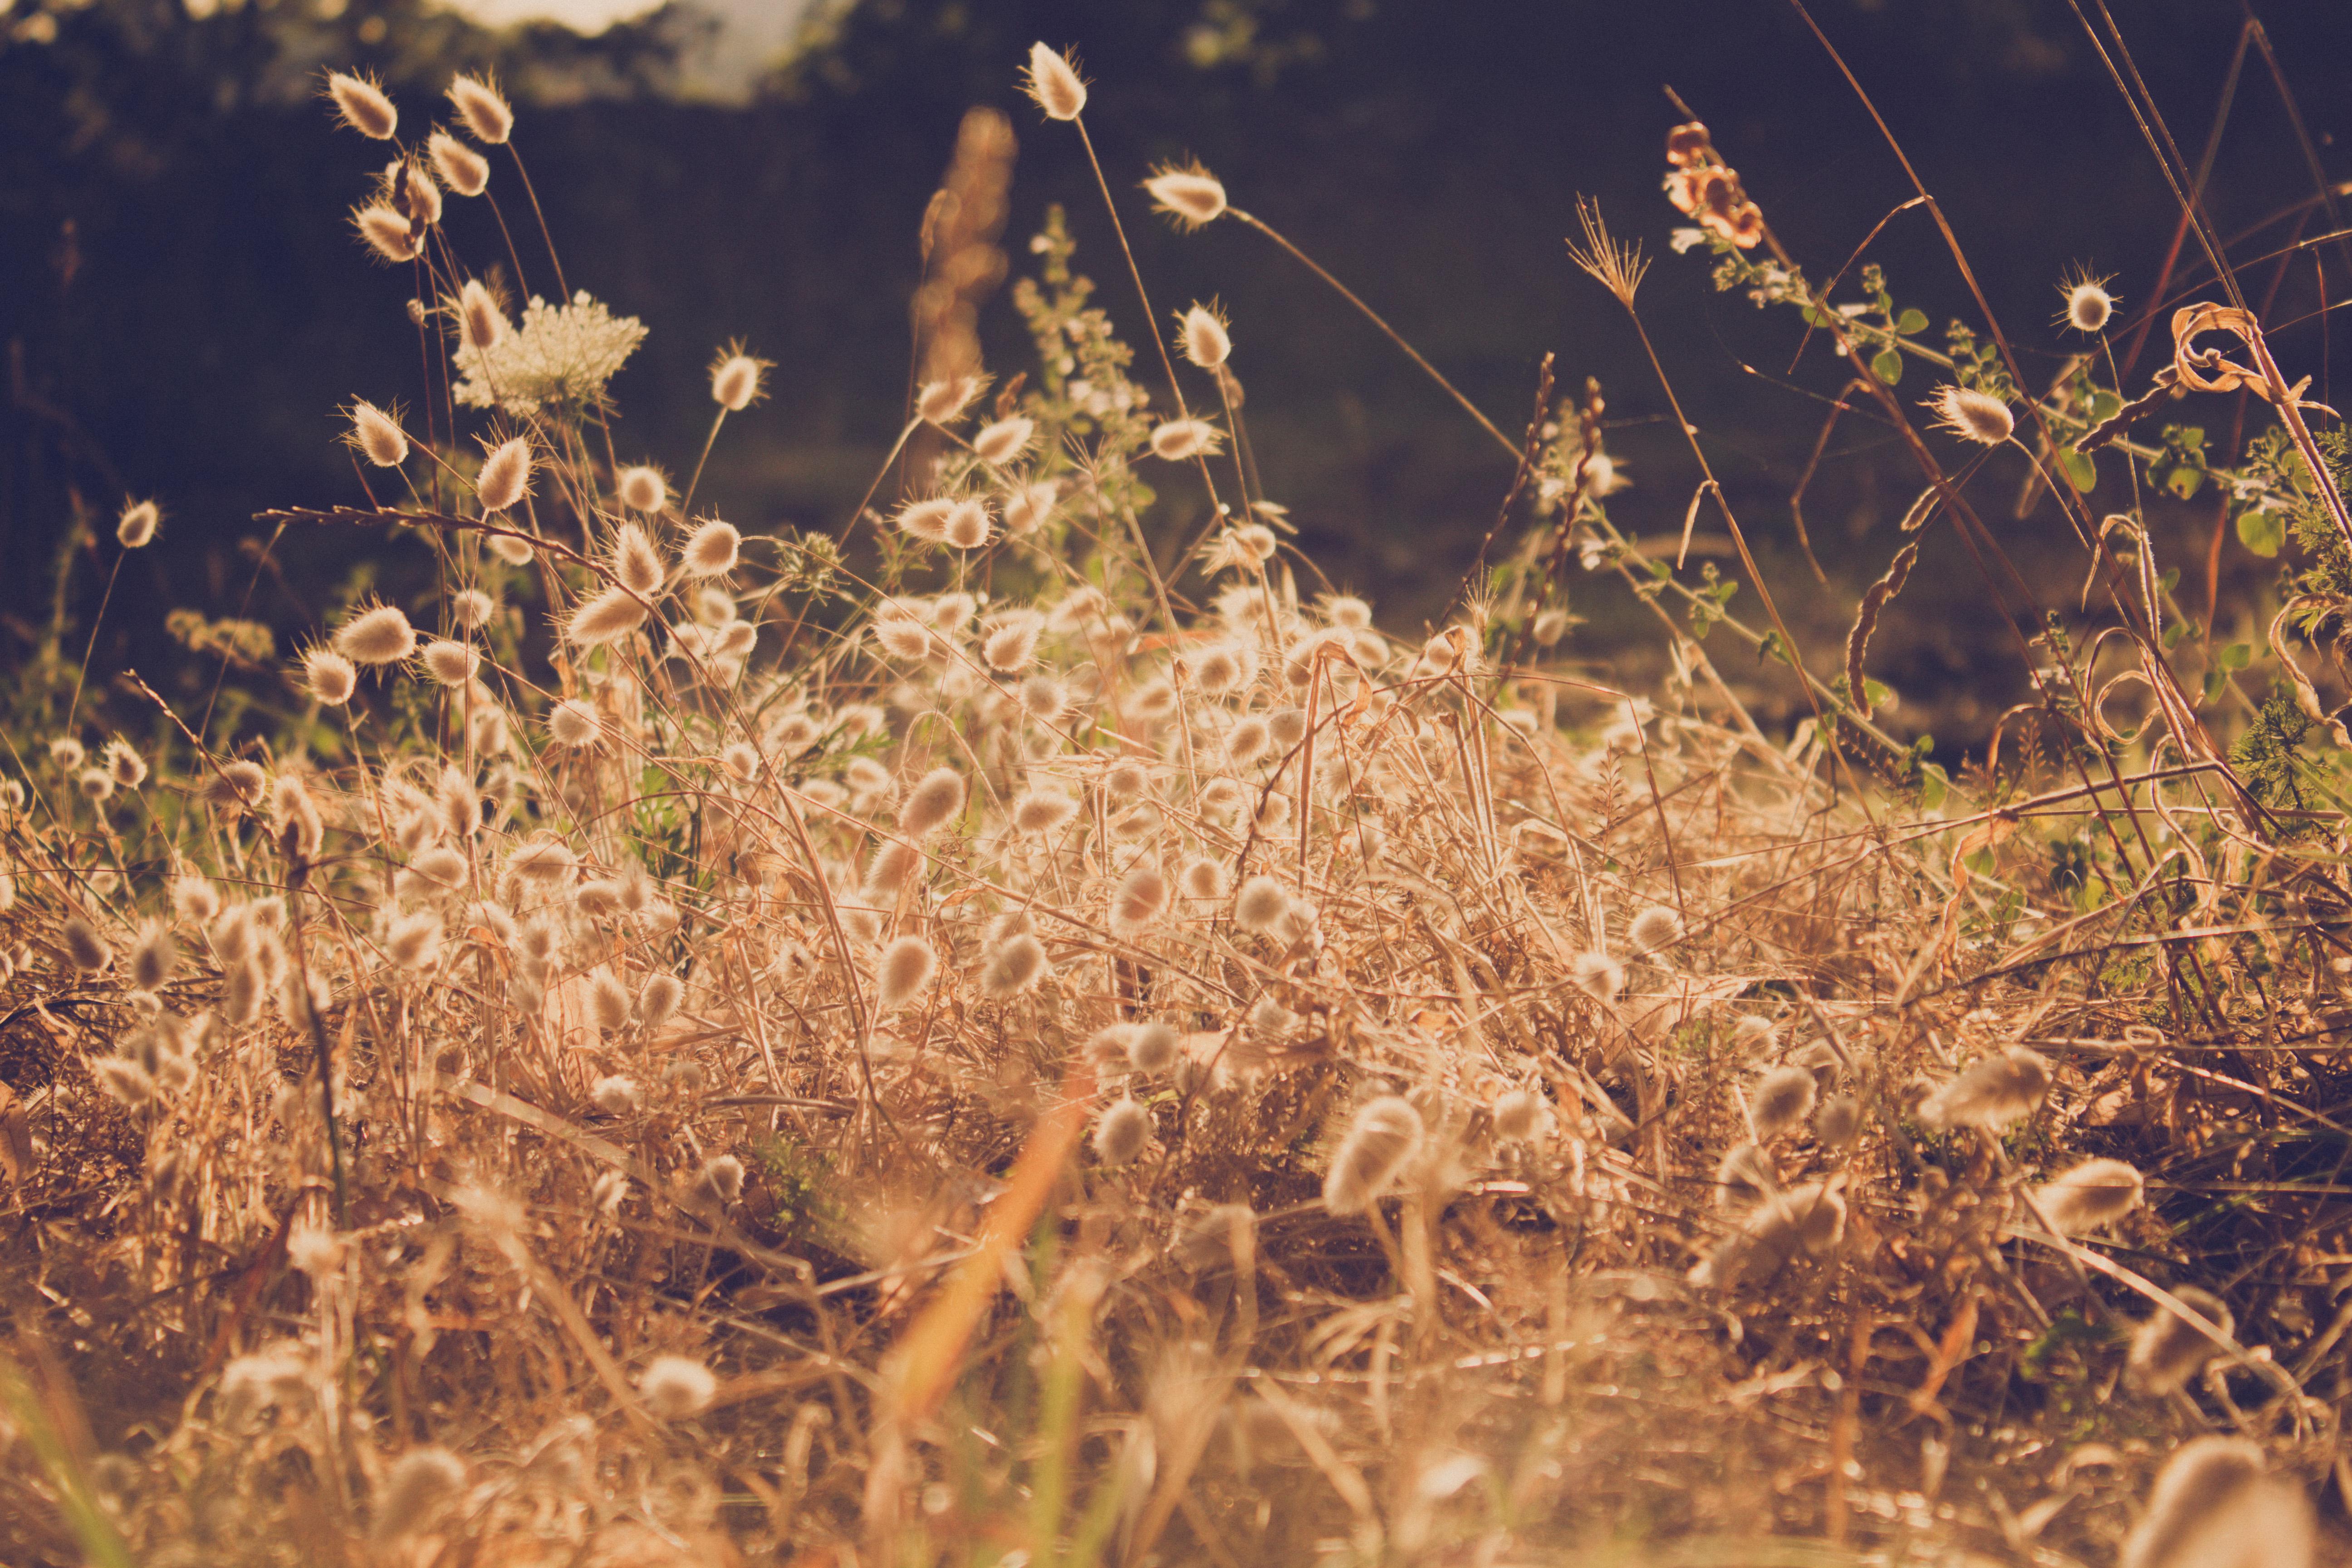 Weed gold, vegetation, plant, weed, sunset